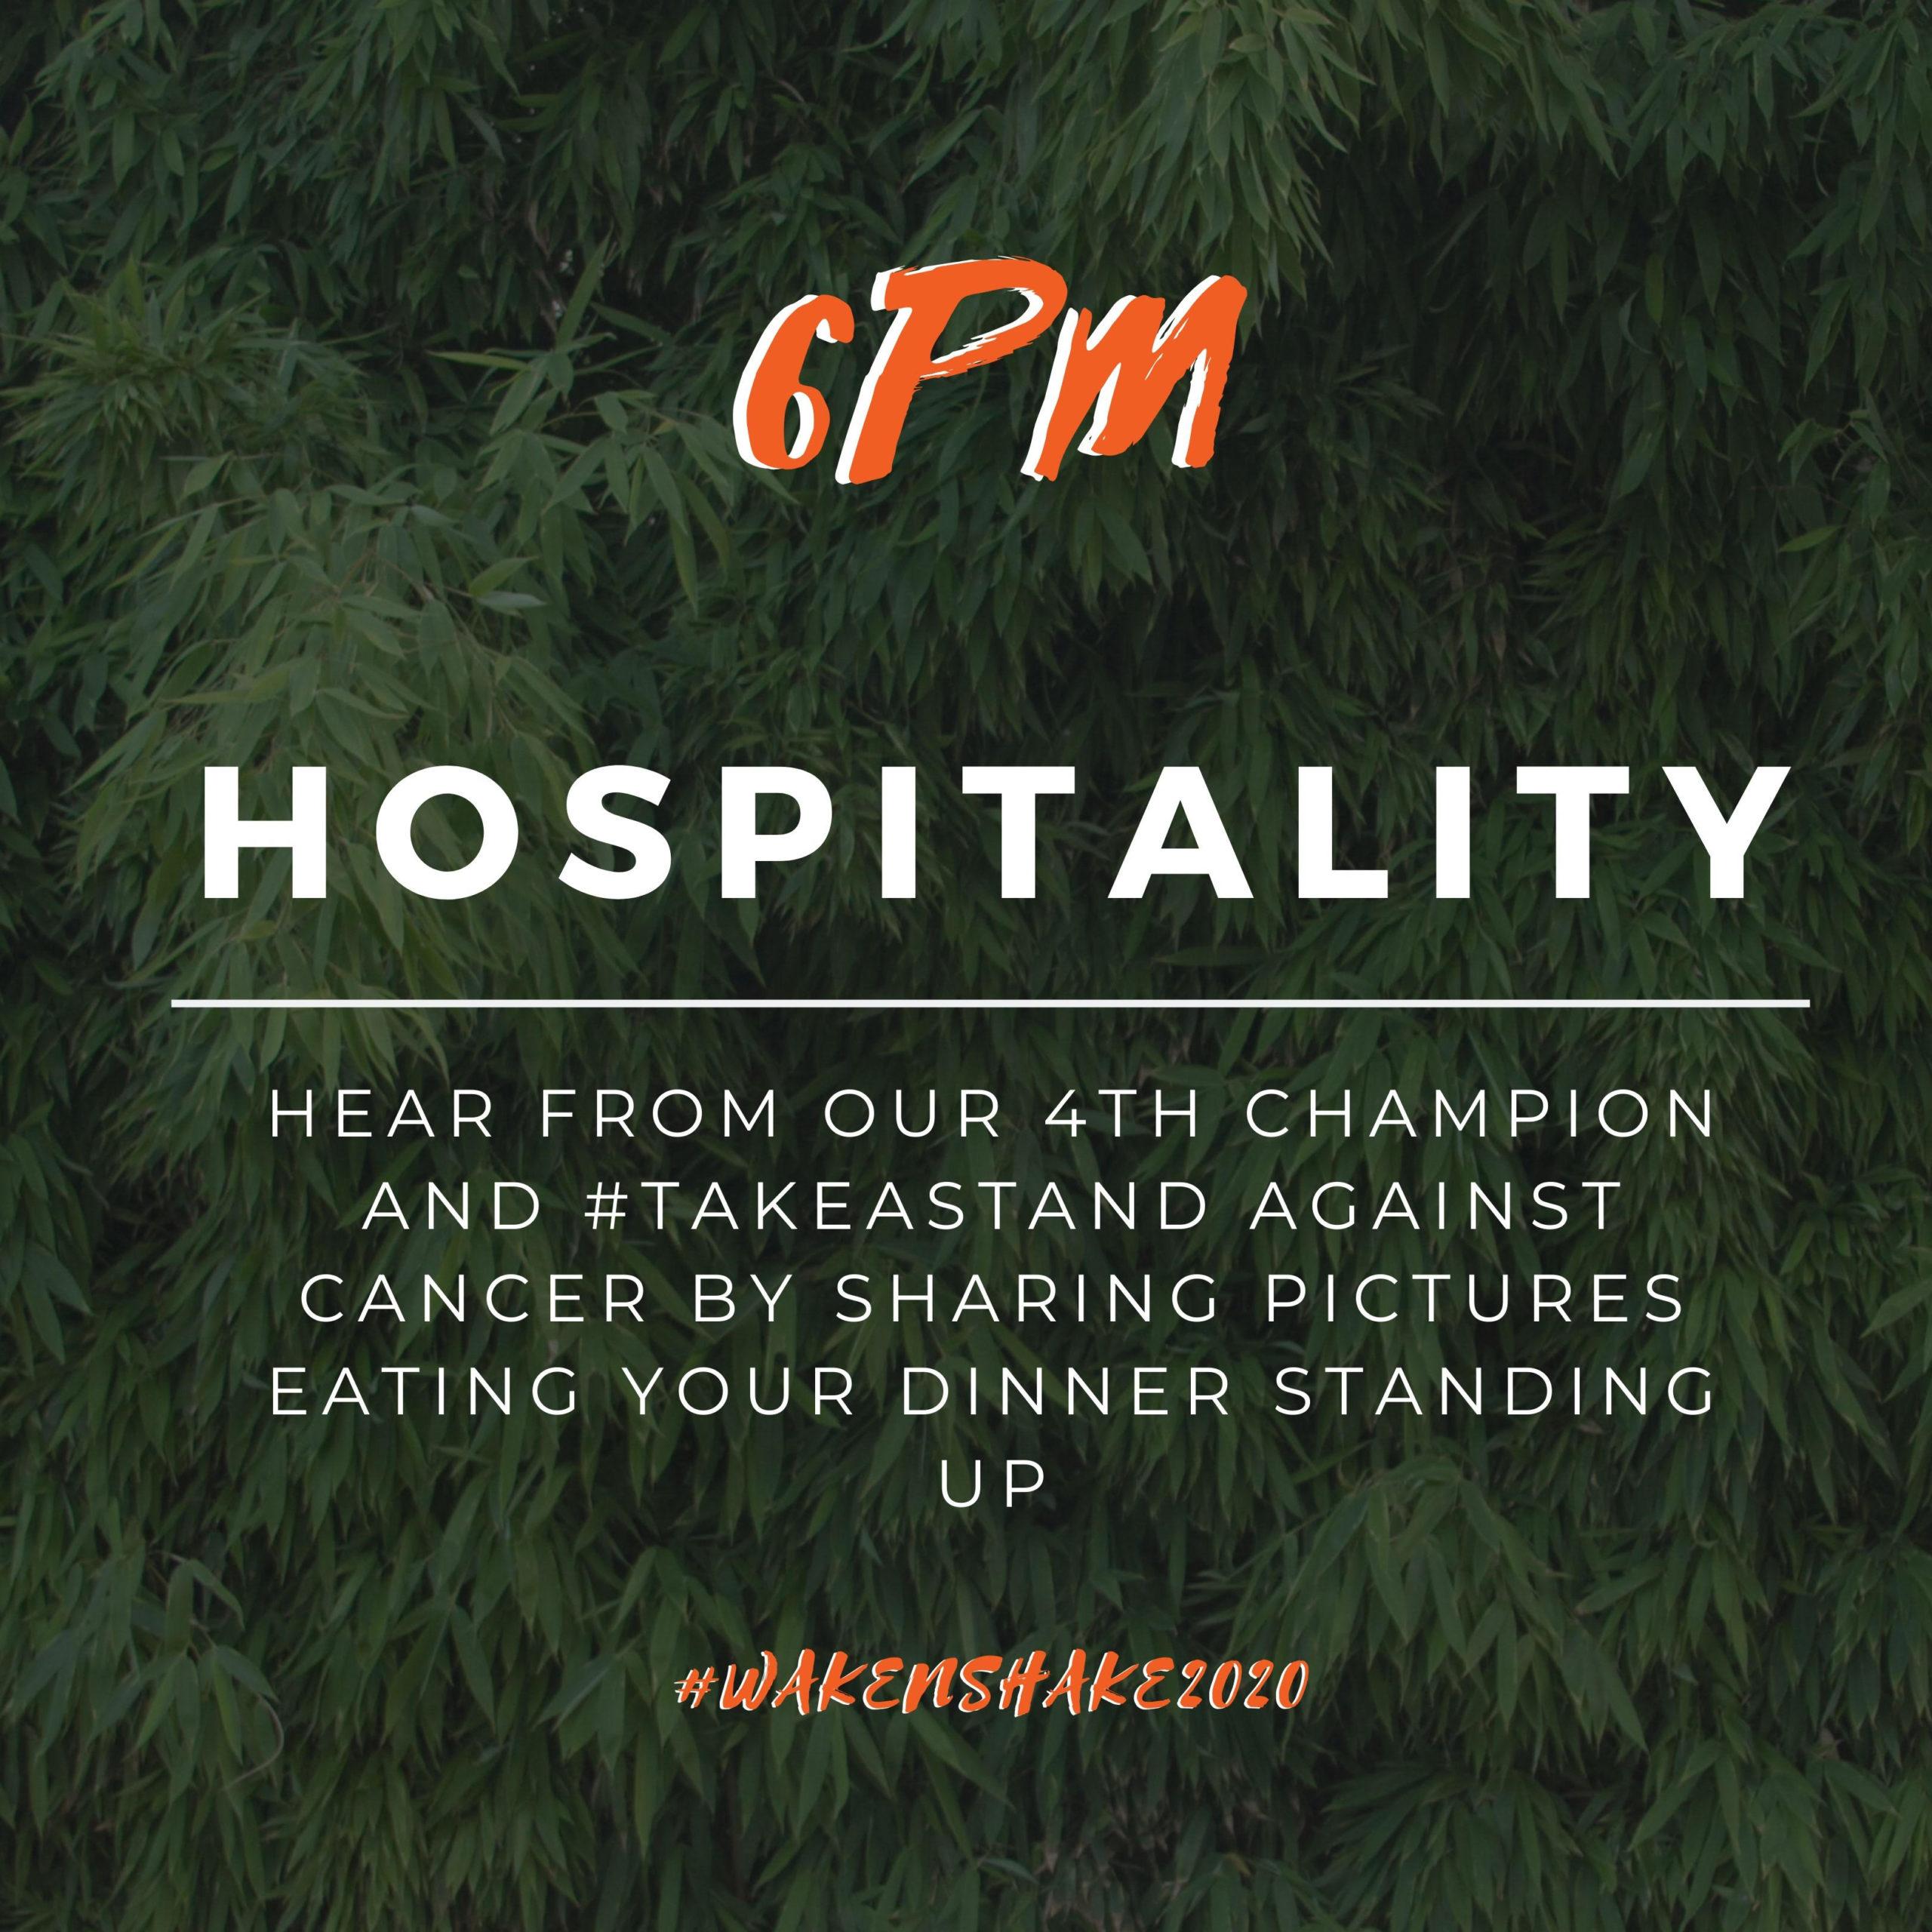 6 pm-hospitality